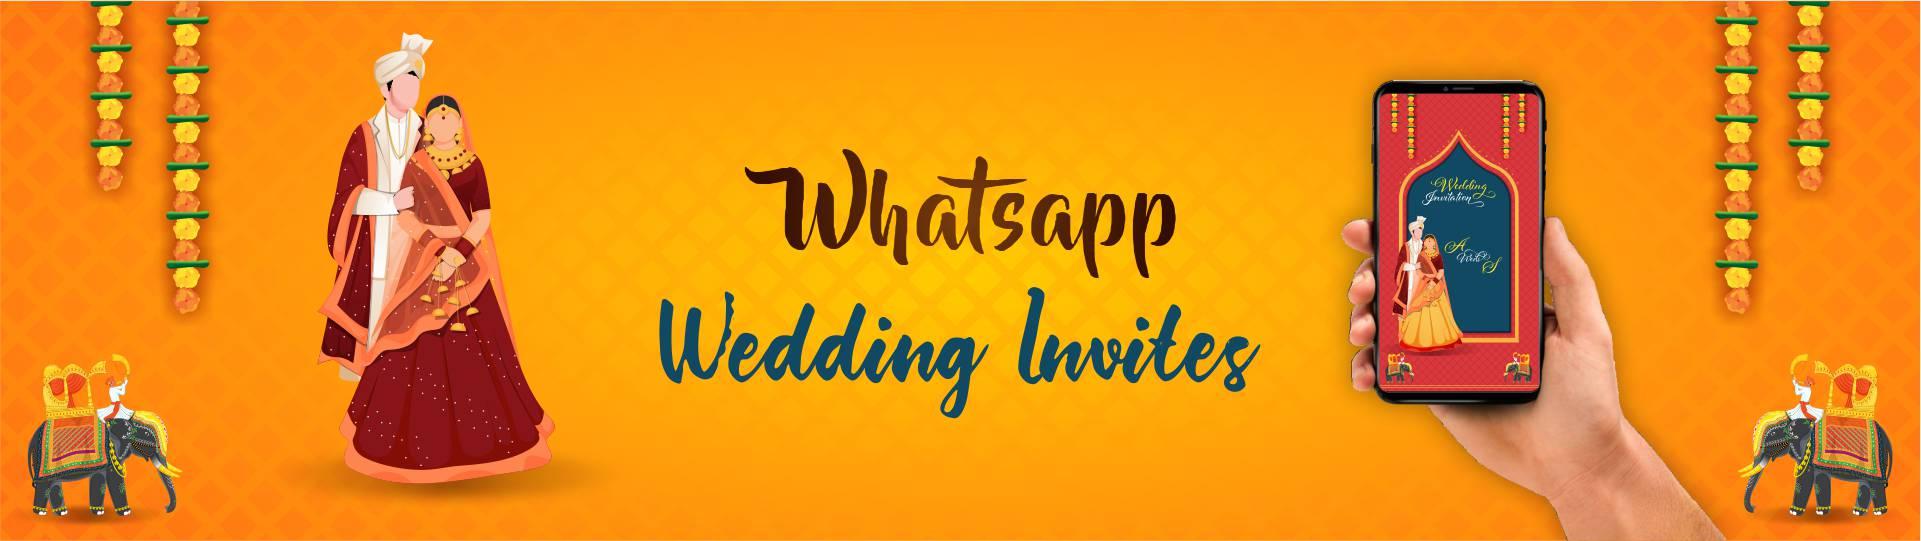 whatsApp Wedding Invitation video